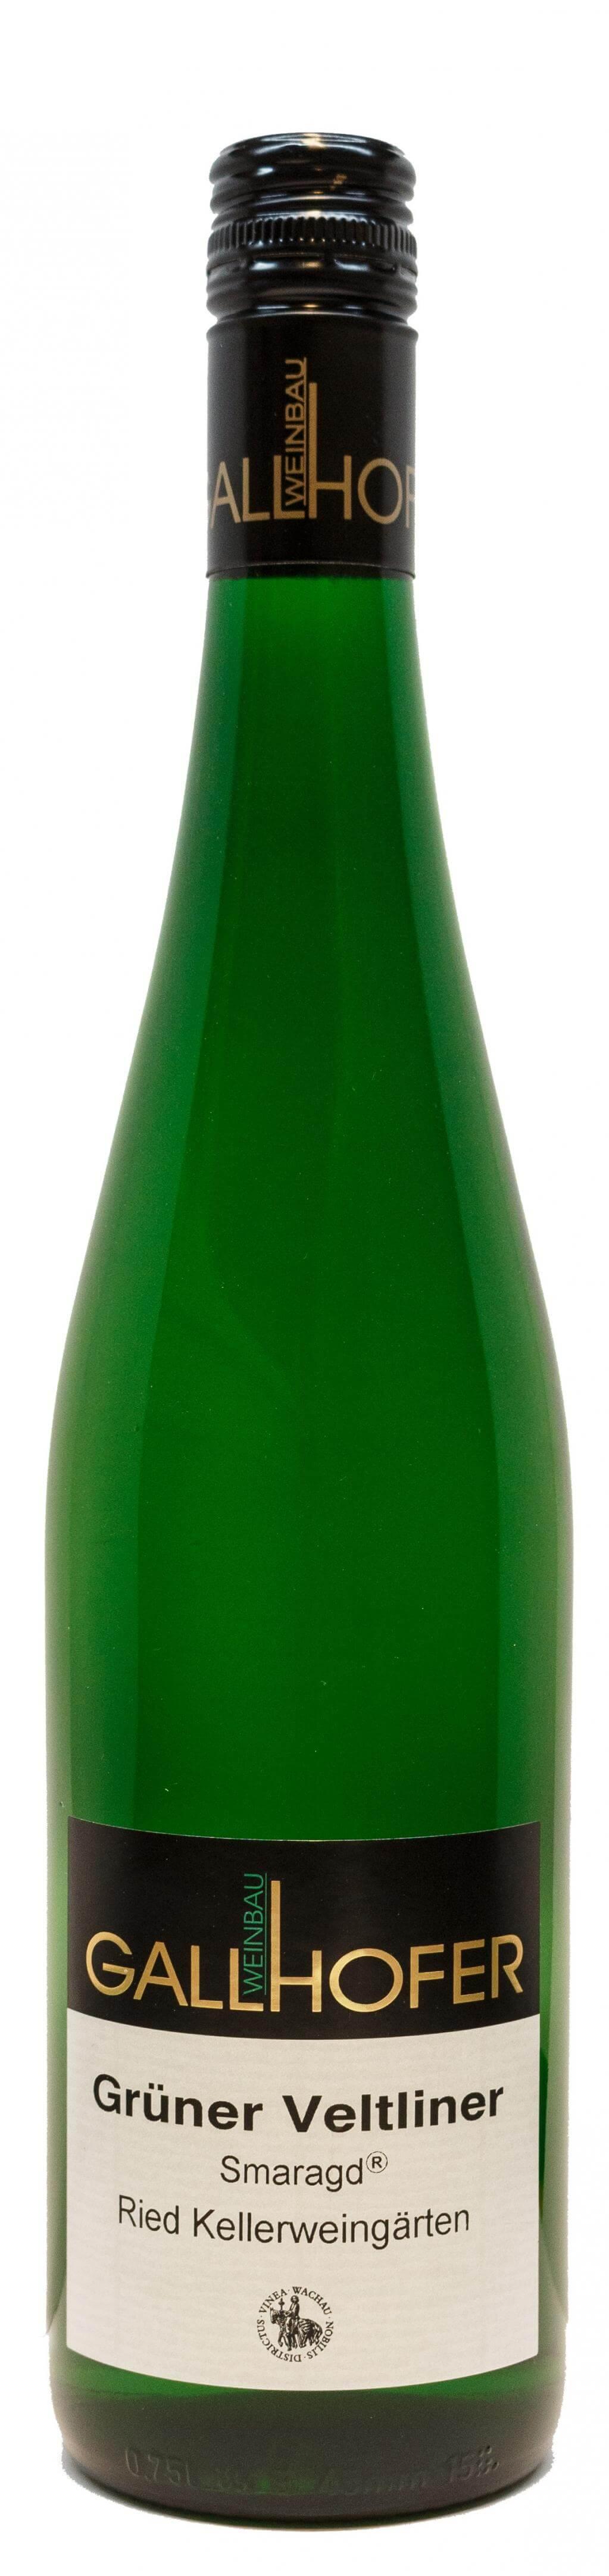 Grüner Veltliner Smaragd  2016 / Weinbau Gallhofer